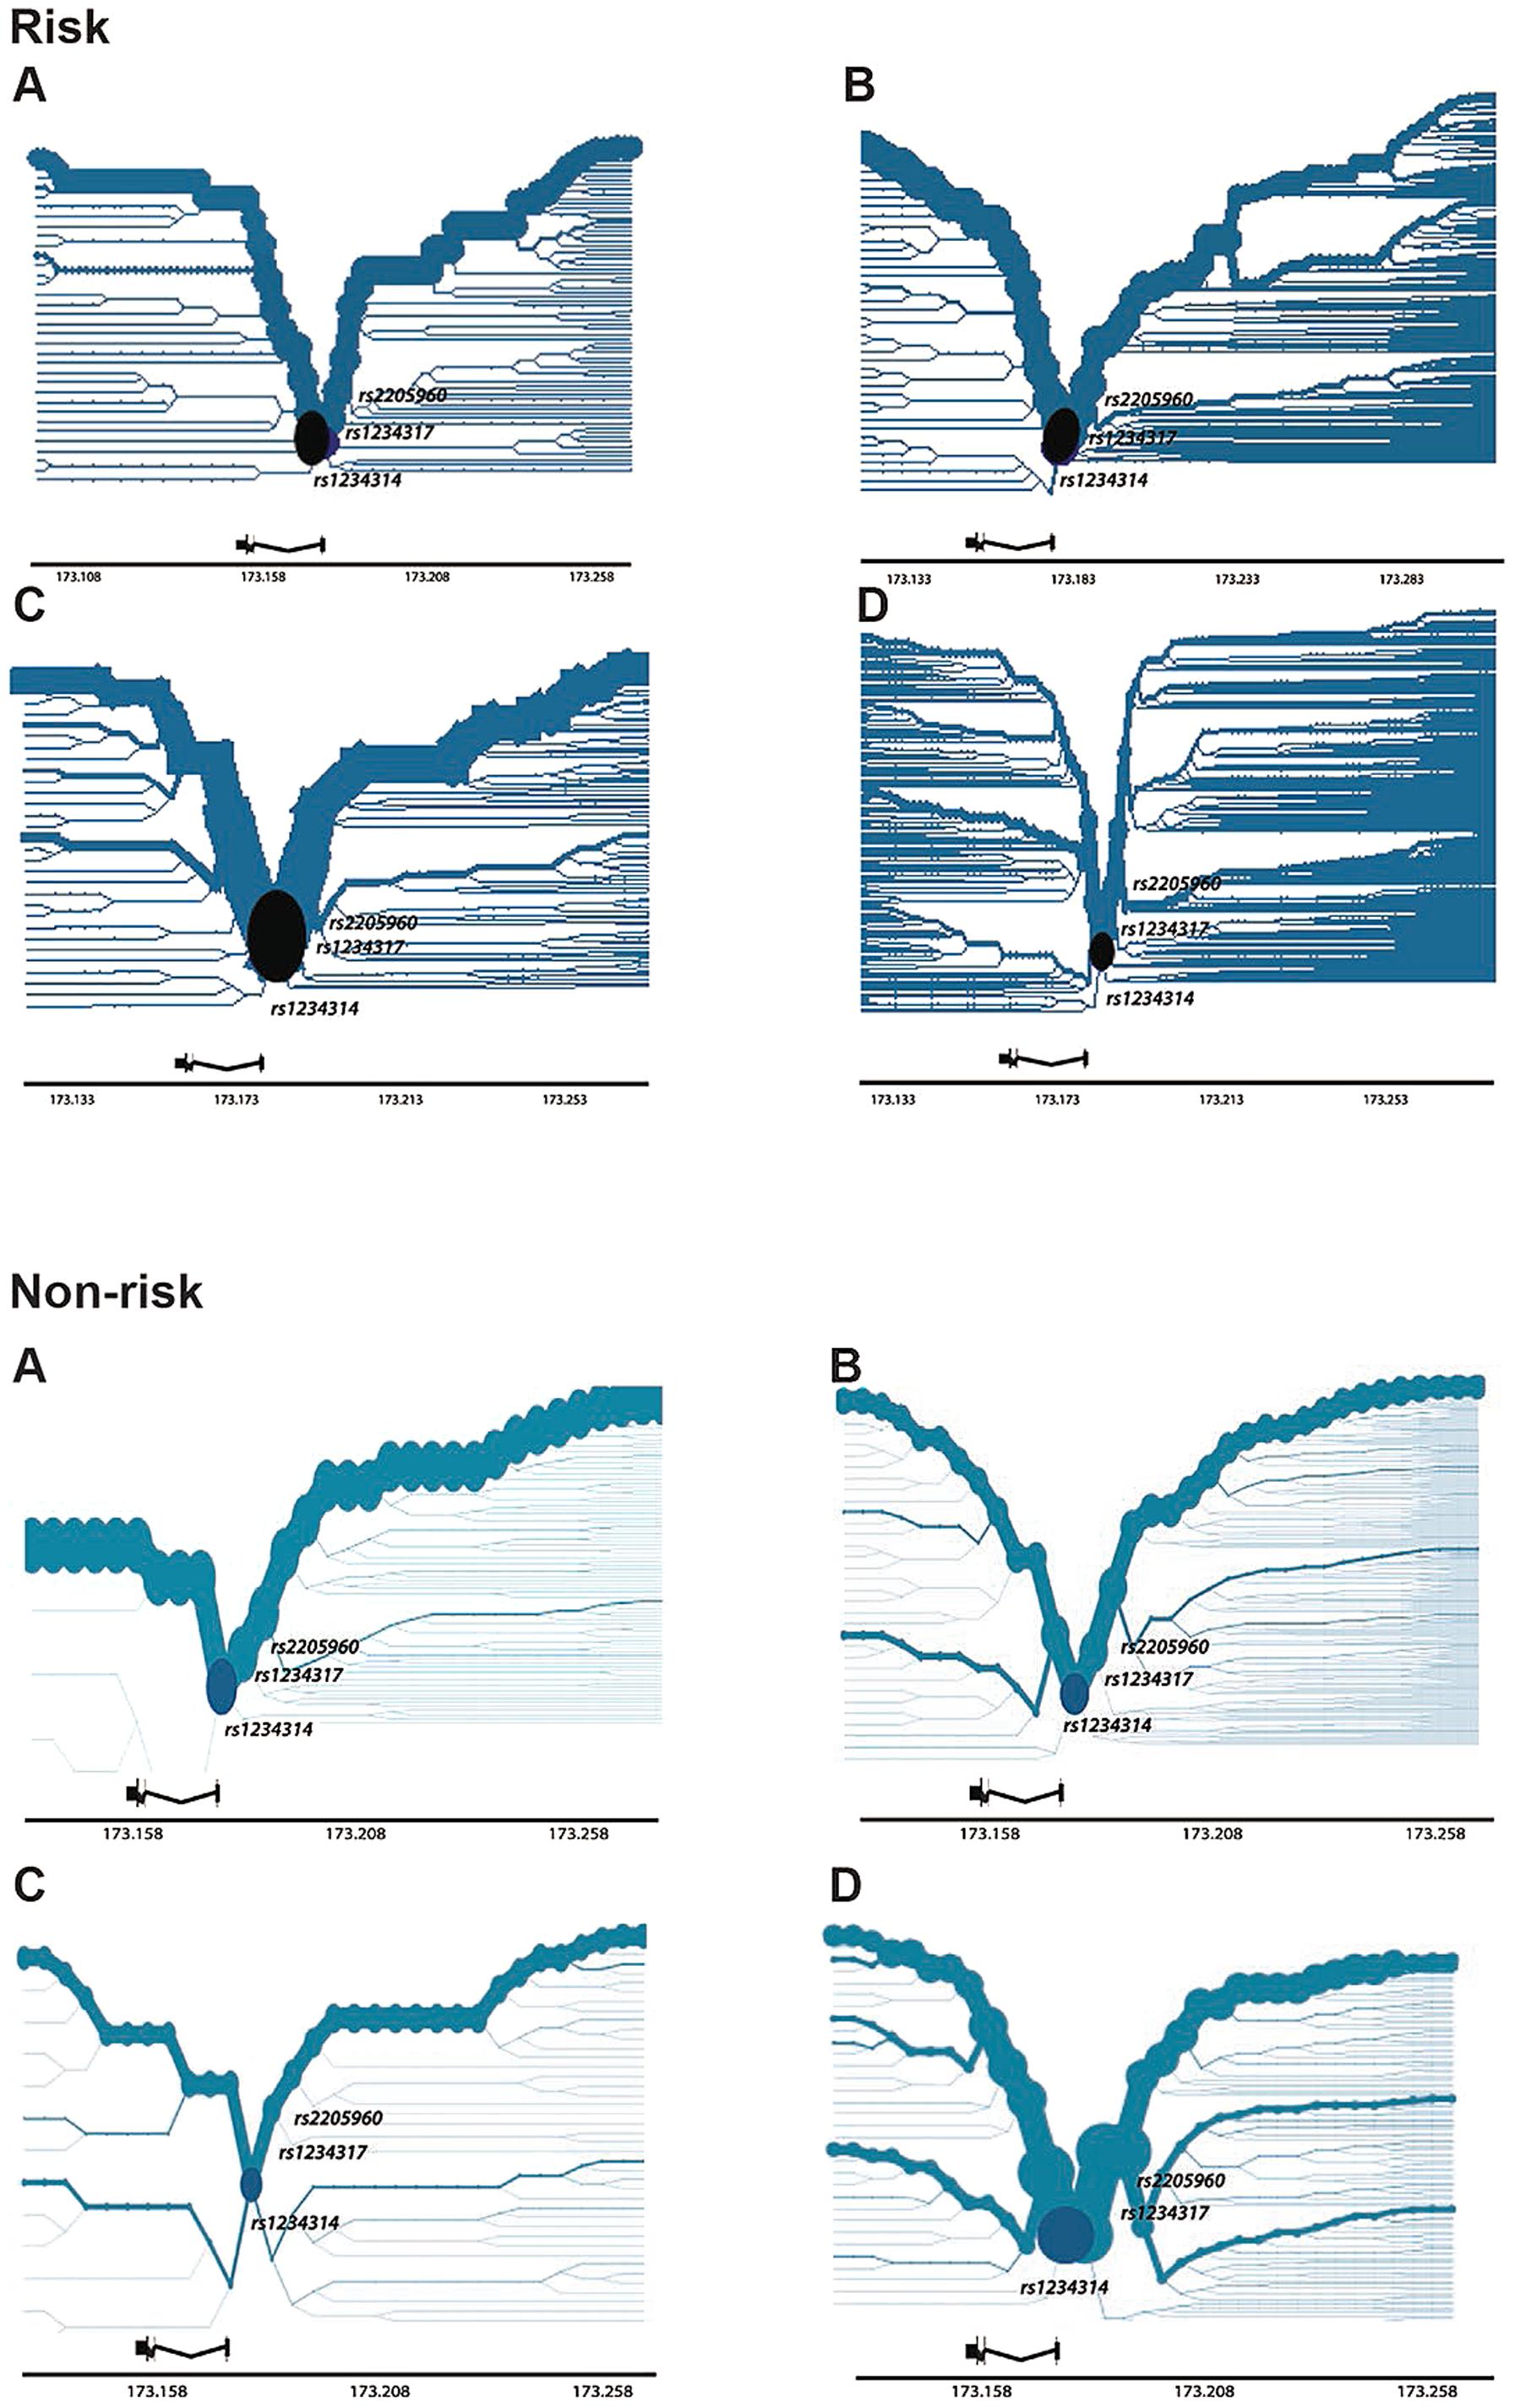 Haplotype Bifurcation Diagrams of <i>TNFSF4<sub>risk</sub></i> and <i>TNFSF4<sub>non-</sub></i><sub><b>risk</b></sub> for Four Populations.